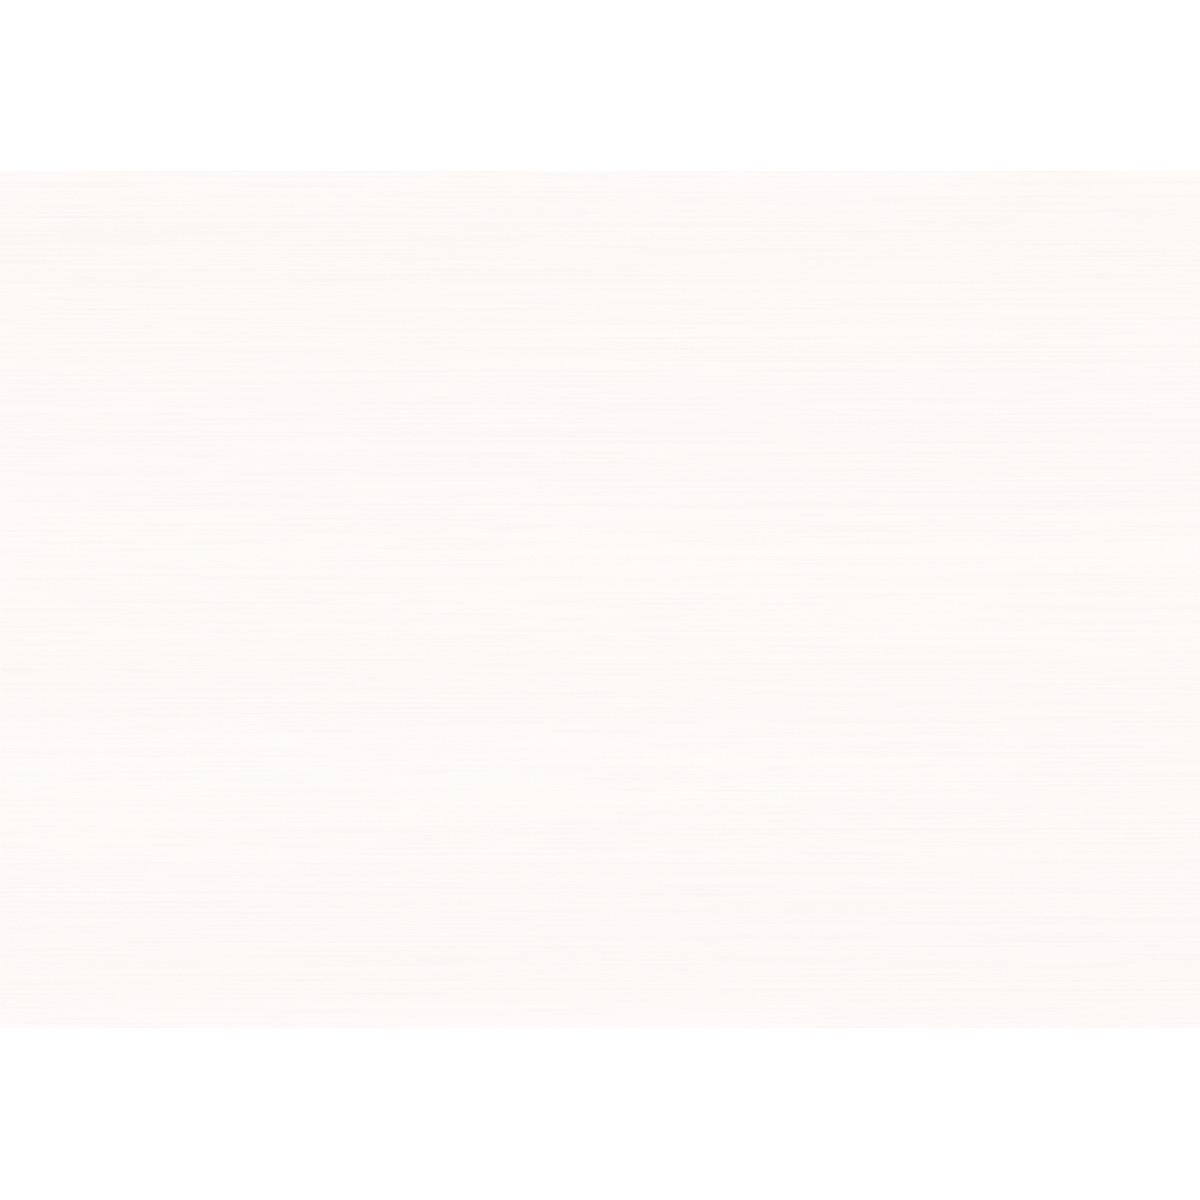 Плитка настенная Melissa 25х35 см 1.4 м2 цвет светлый